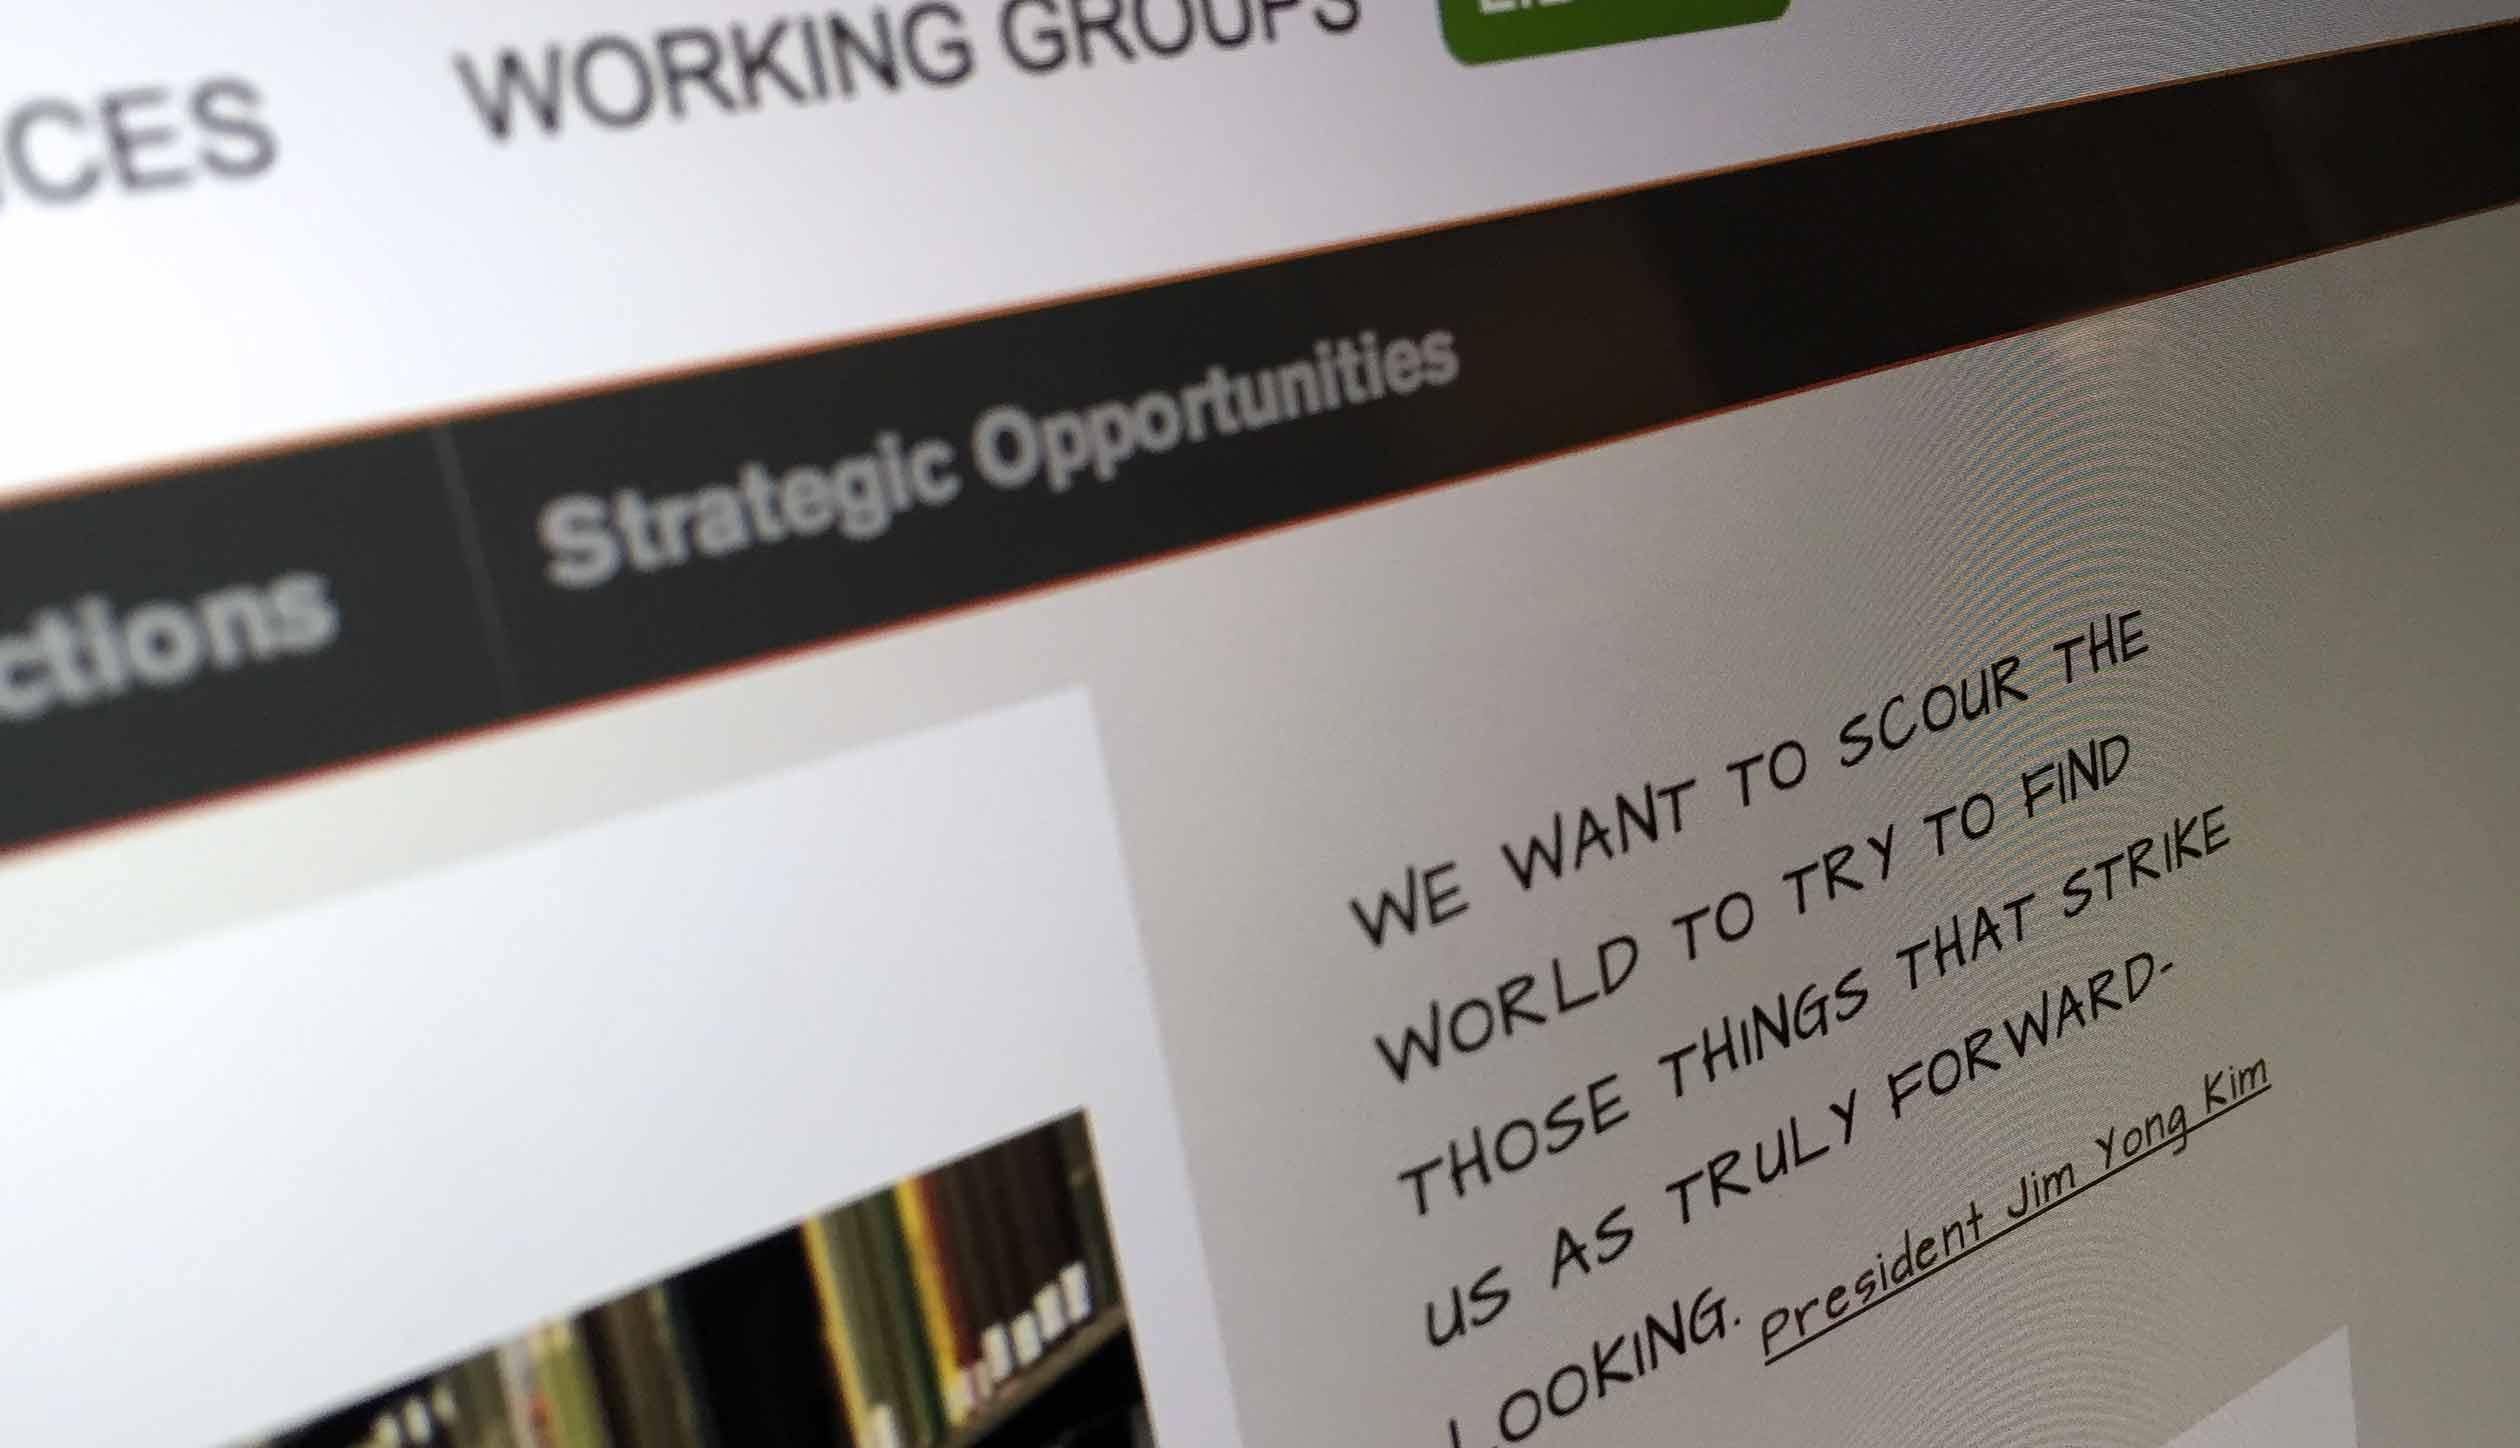 Dartmouth Strategic Planning President Kim quote